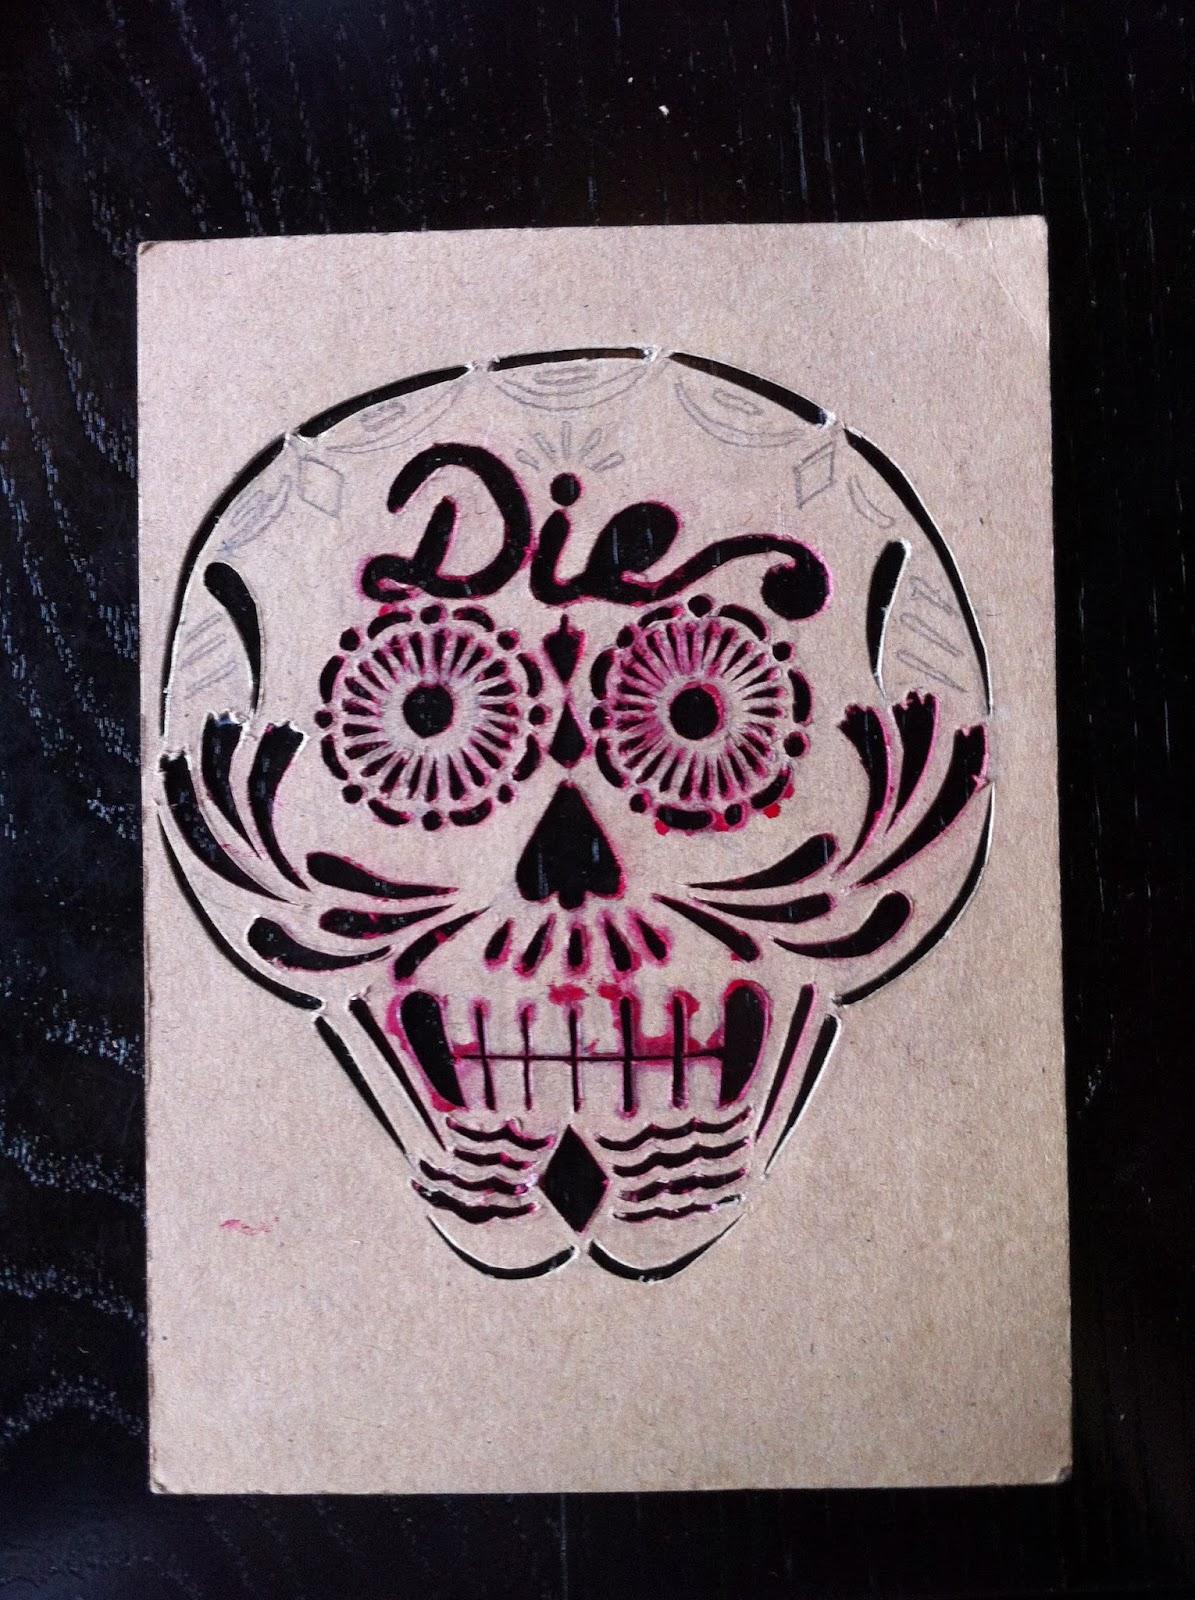 Day Of The Dead Skull Stencil Day of the dead skull stencils